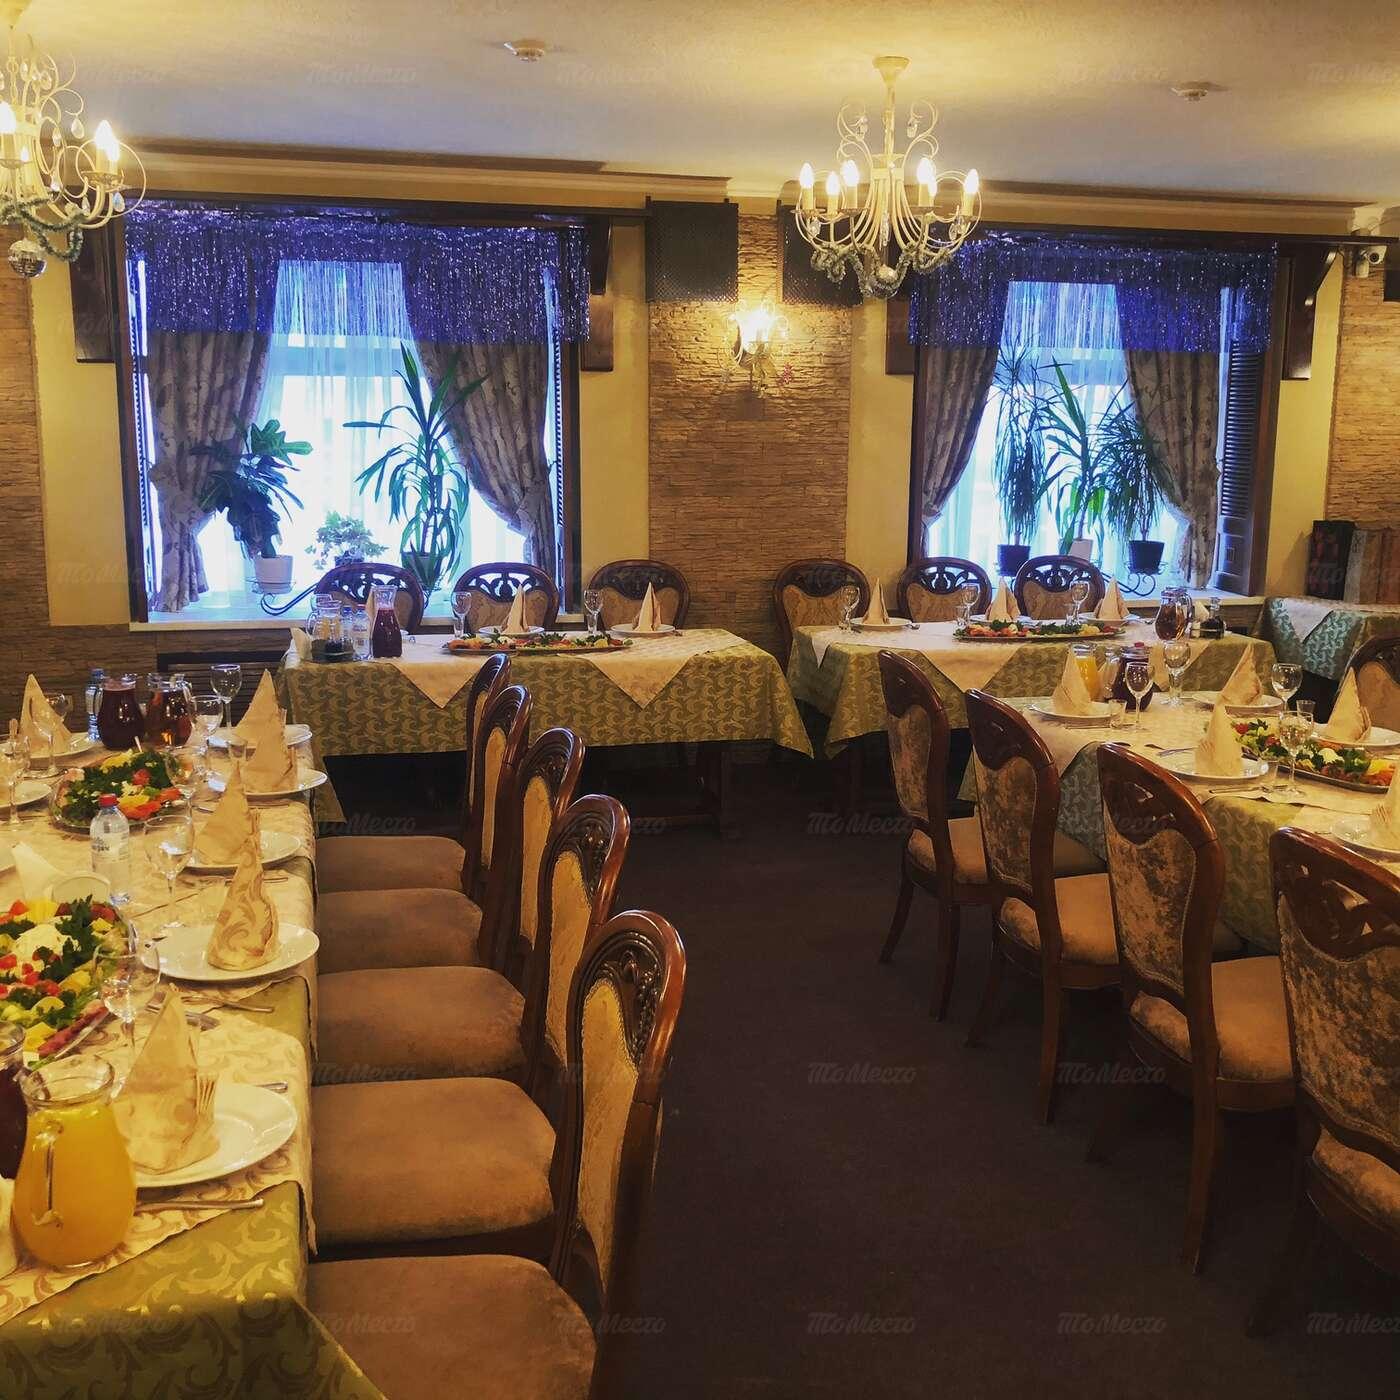 Ресторан Балканский Гурман на Декабристов фото 12